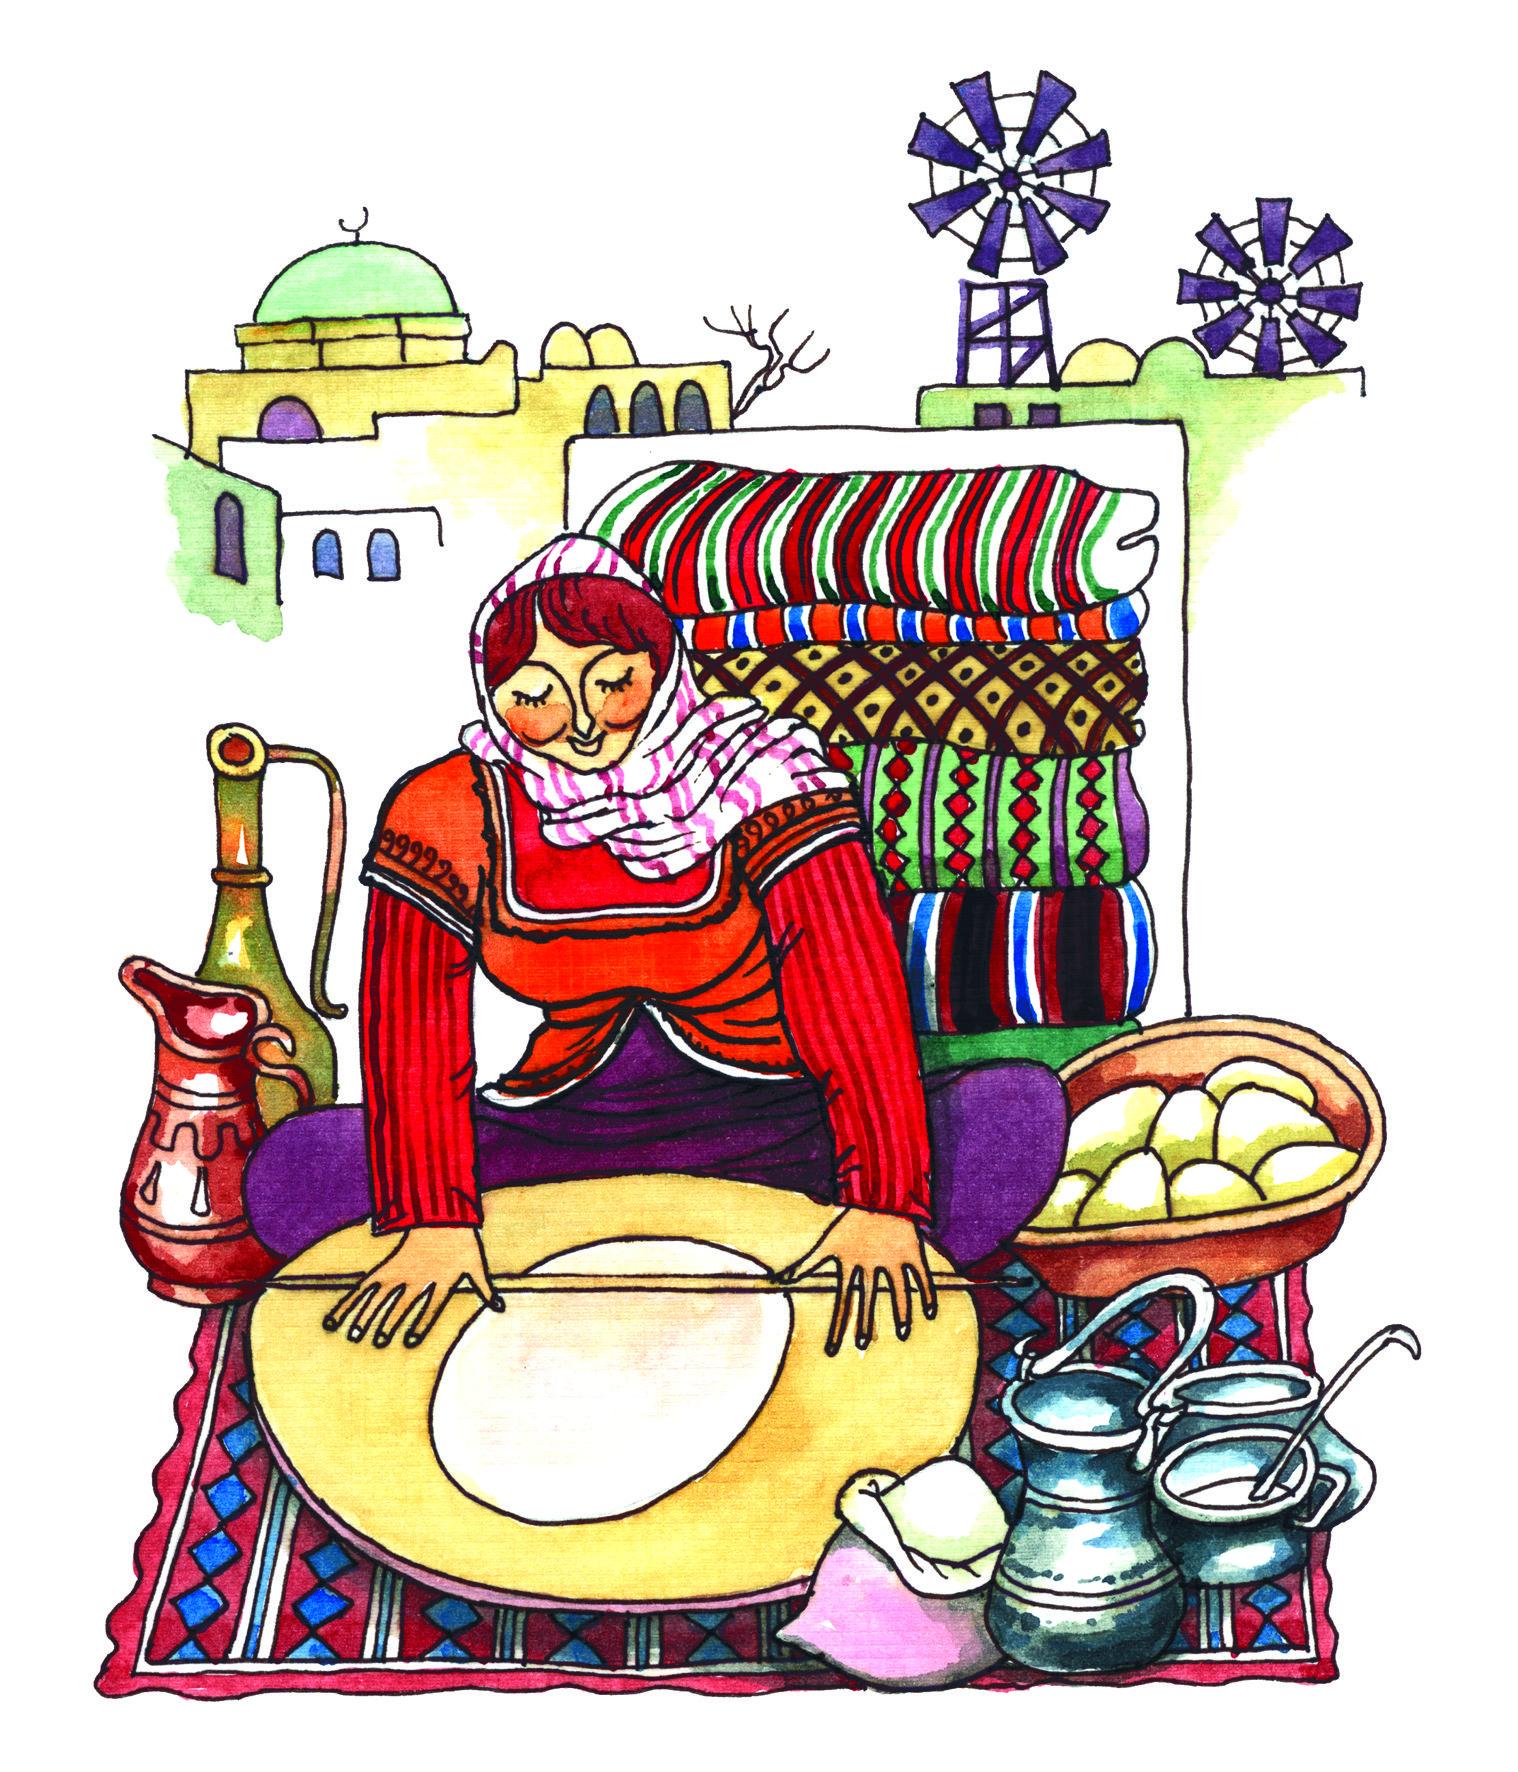 Pin By Eldar On Novruz Bayrami Novruz Holiday Prazdik Novruz Folklore Art Persian Culture Pottery Painting